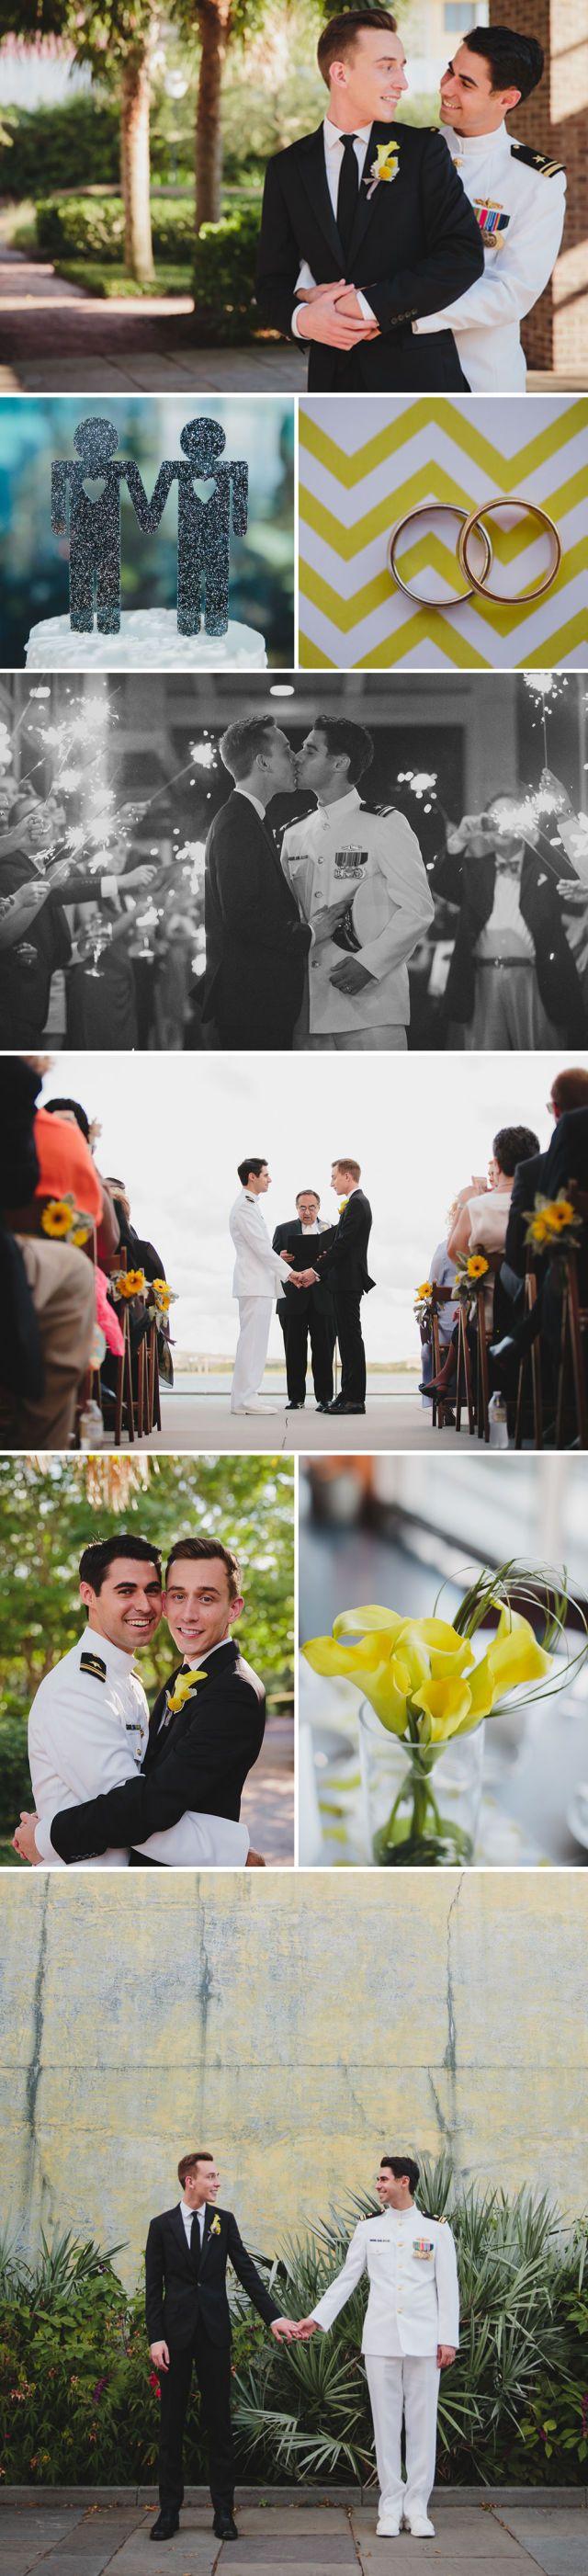 how to get married overseas